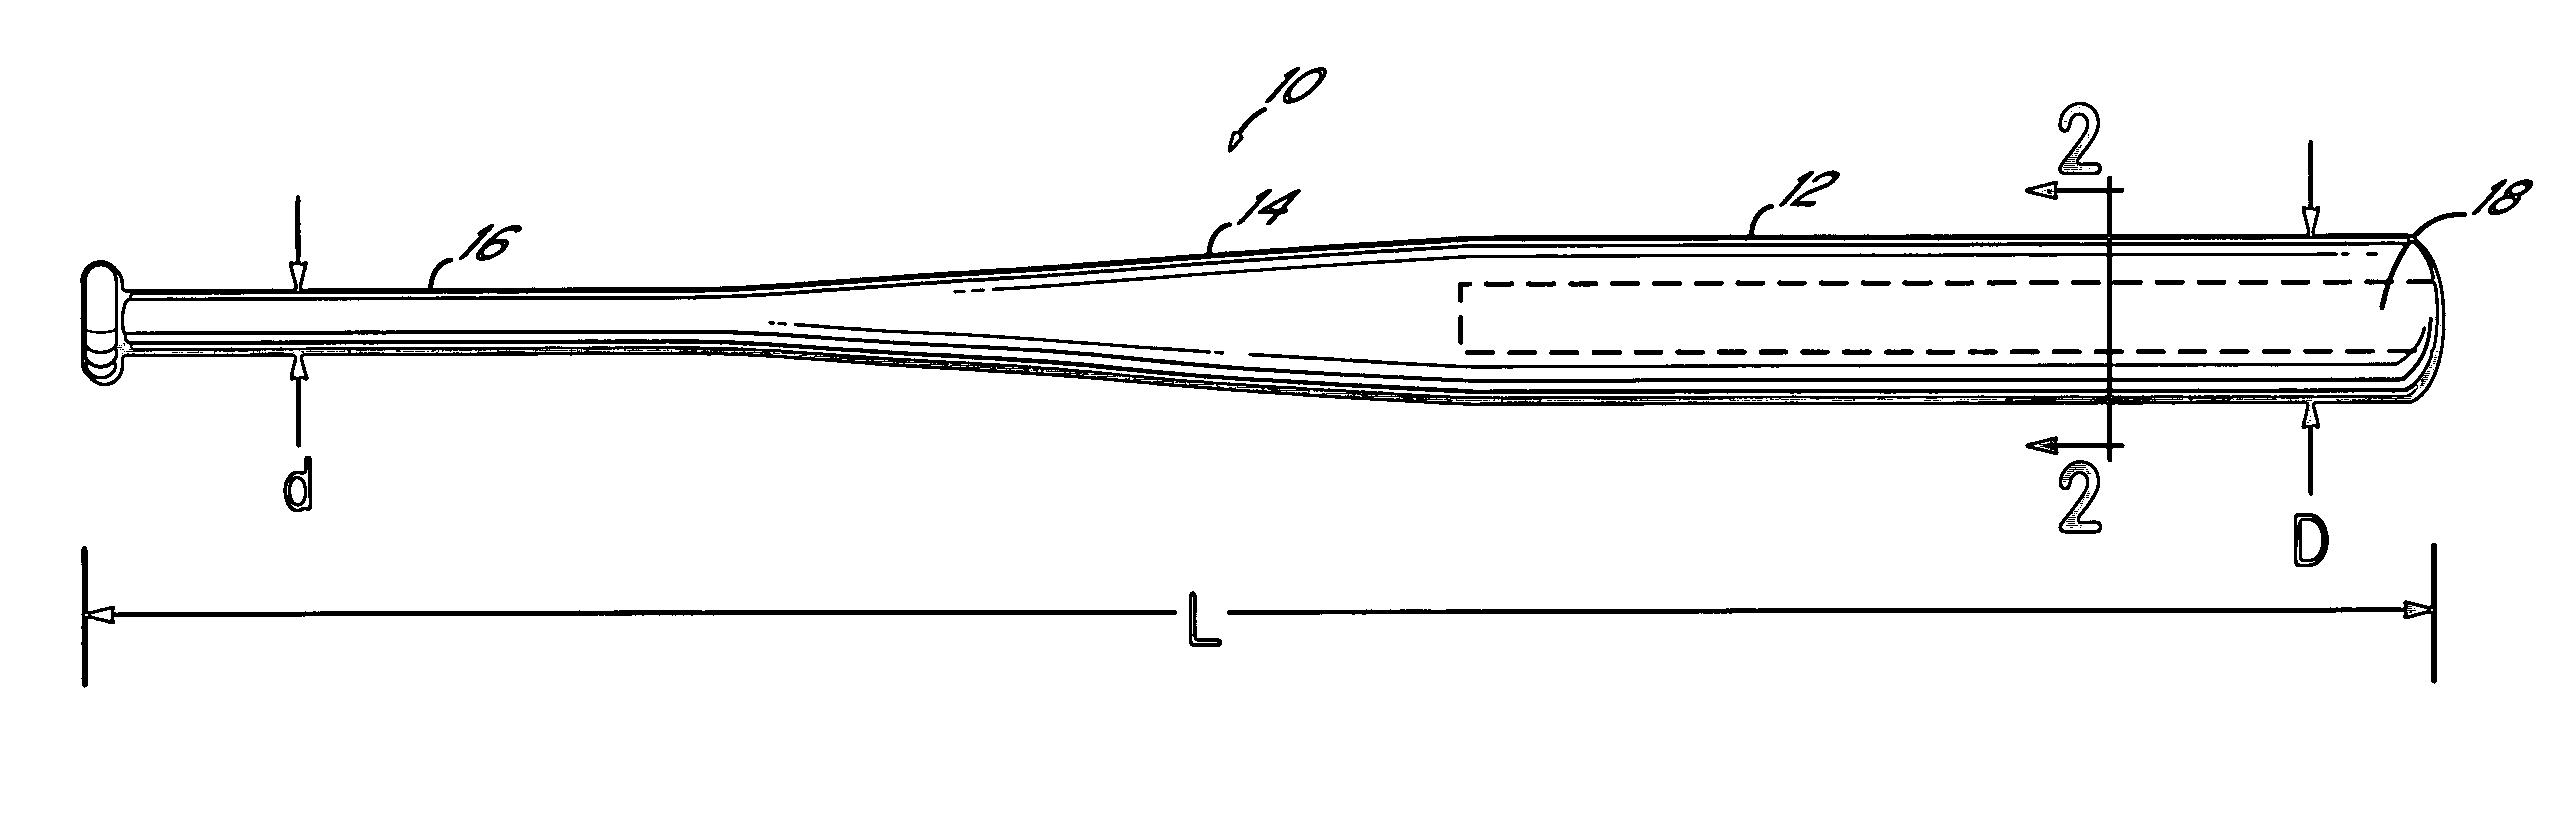 Patent Us20040162169 Training Bat And Method Google